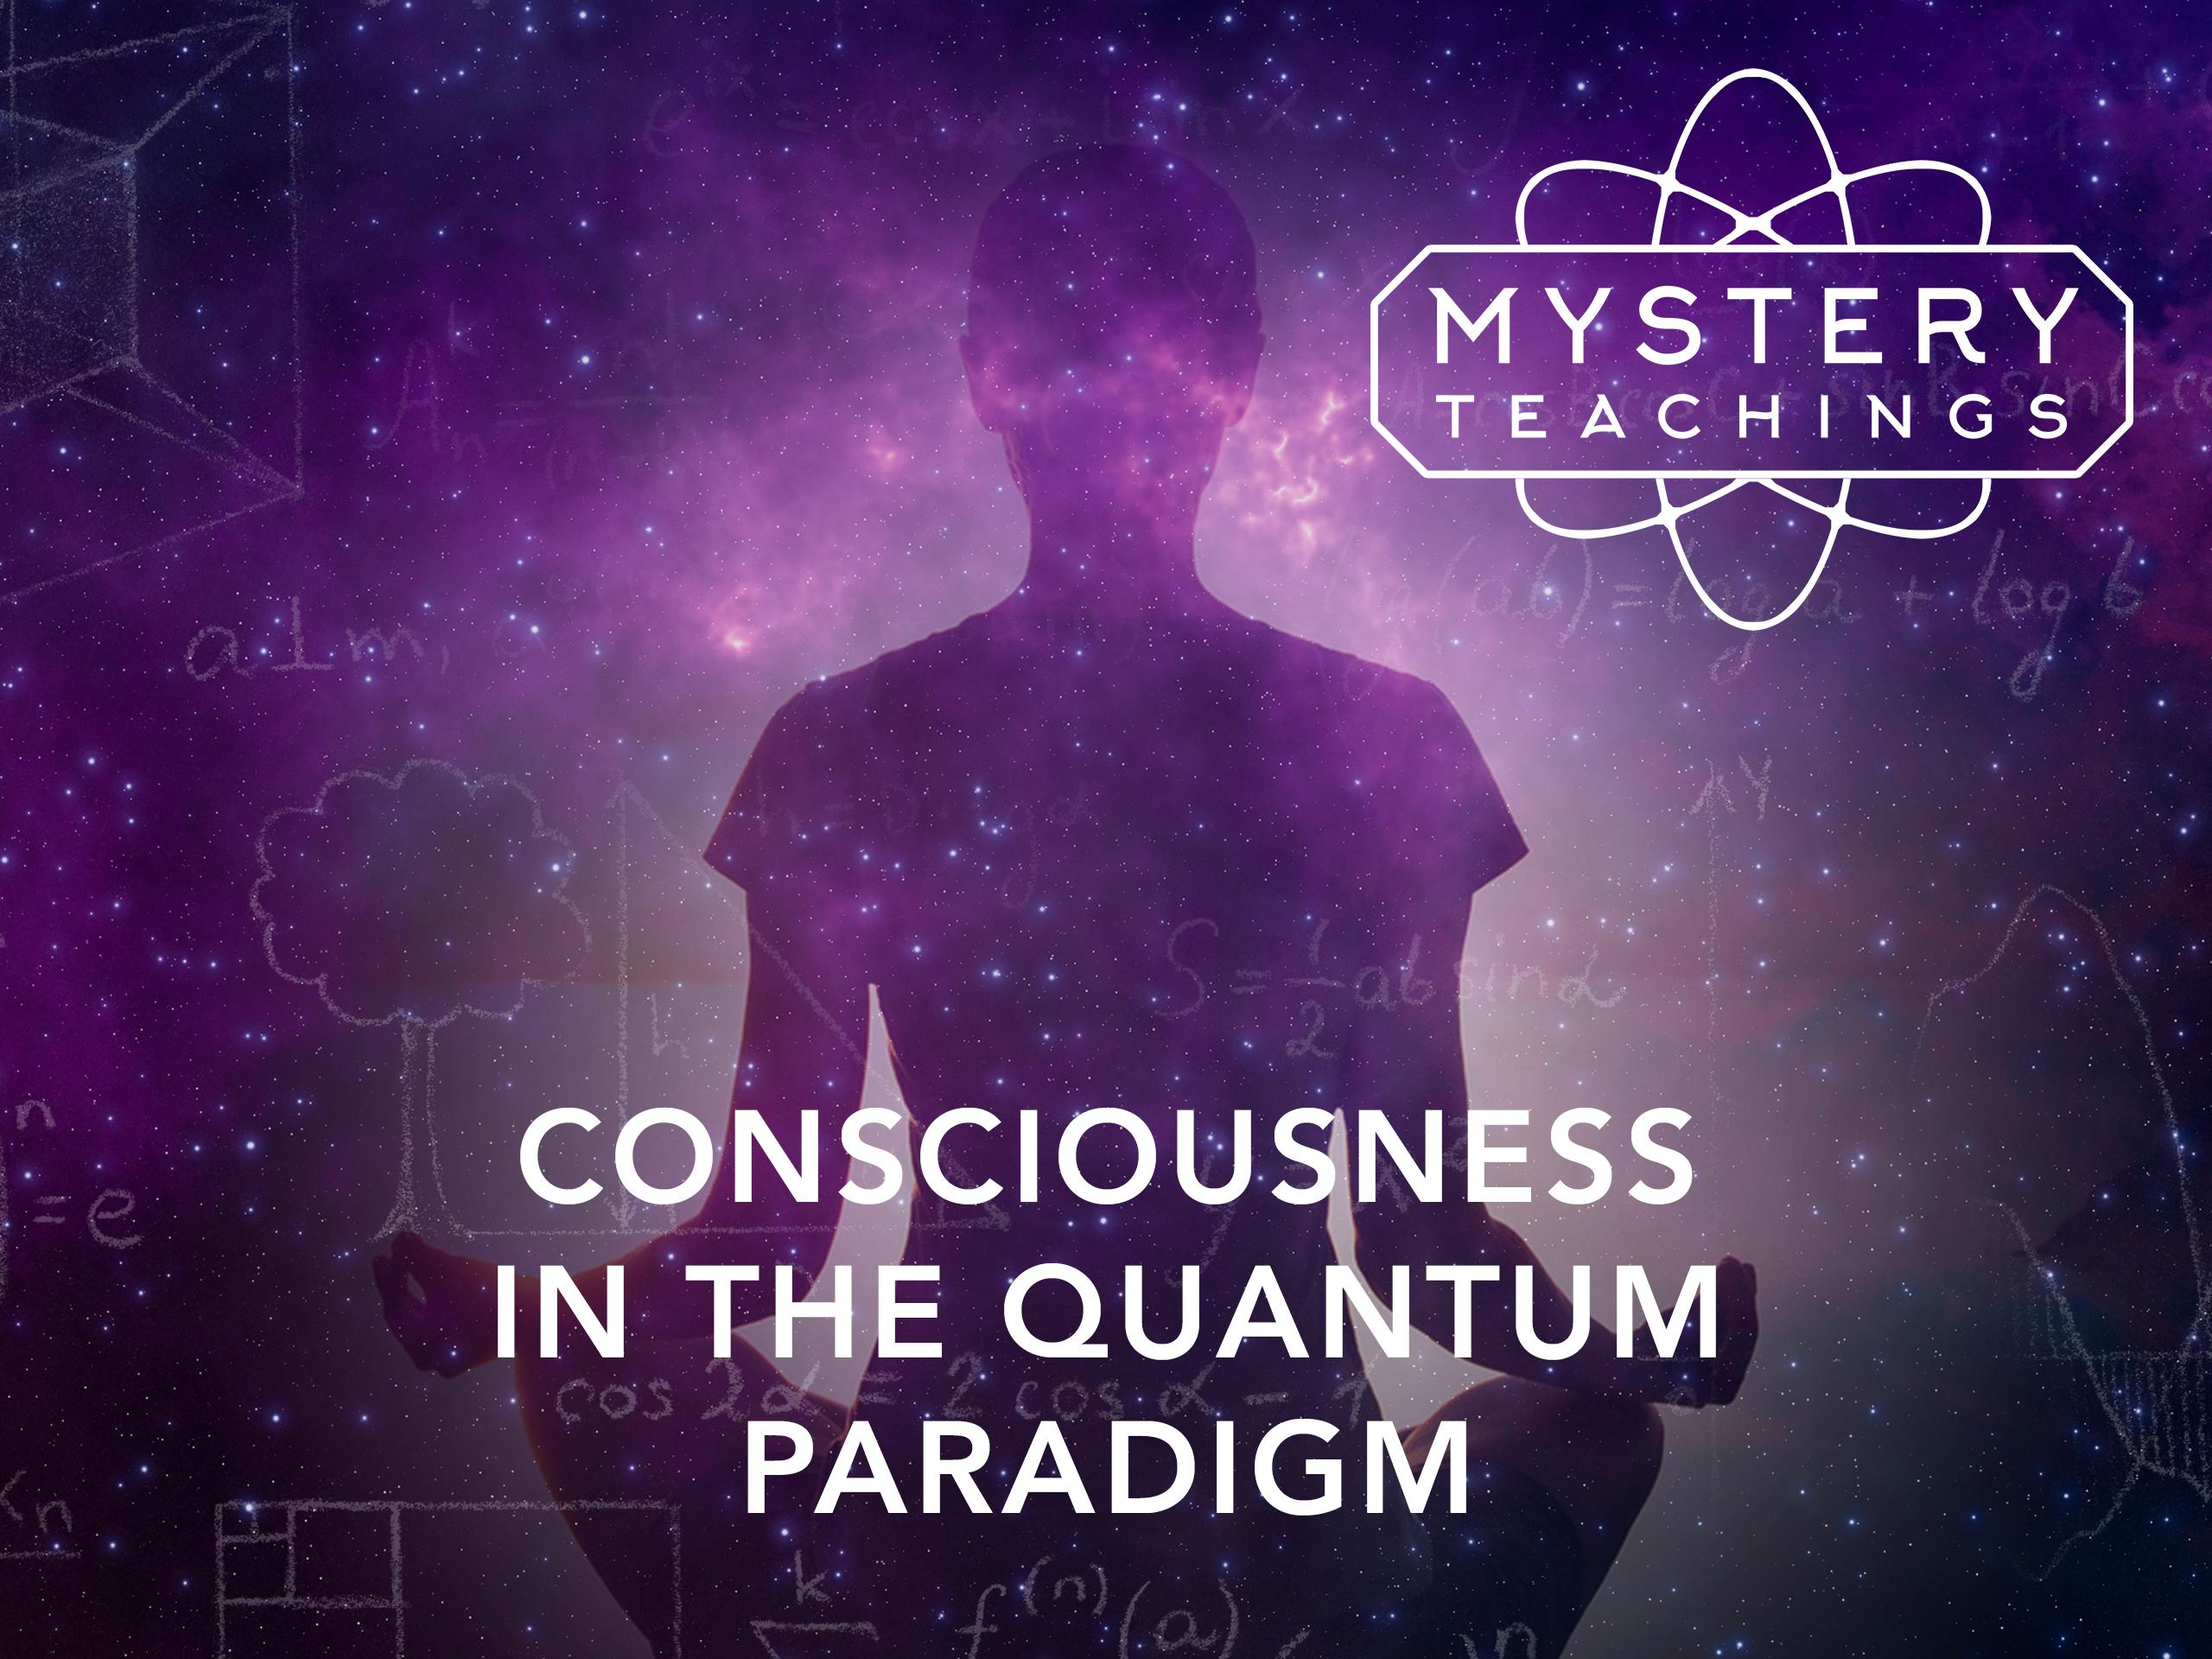 181045-mt_s1e1_conciousness-quantum-paradigms_w_Theresa-Bullard_4x3